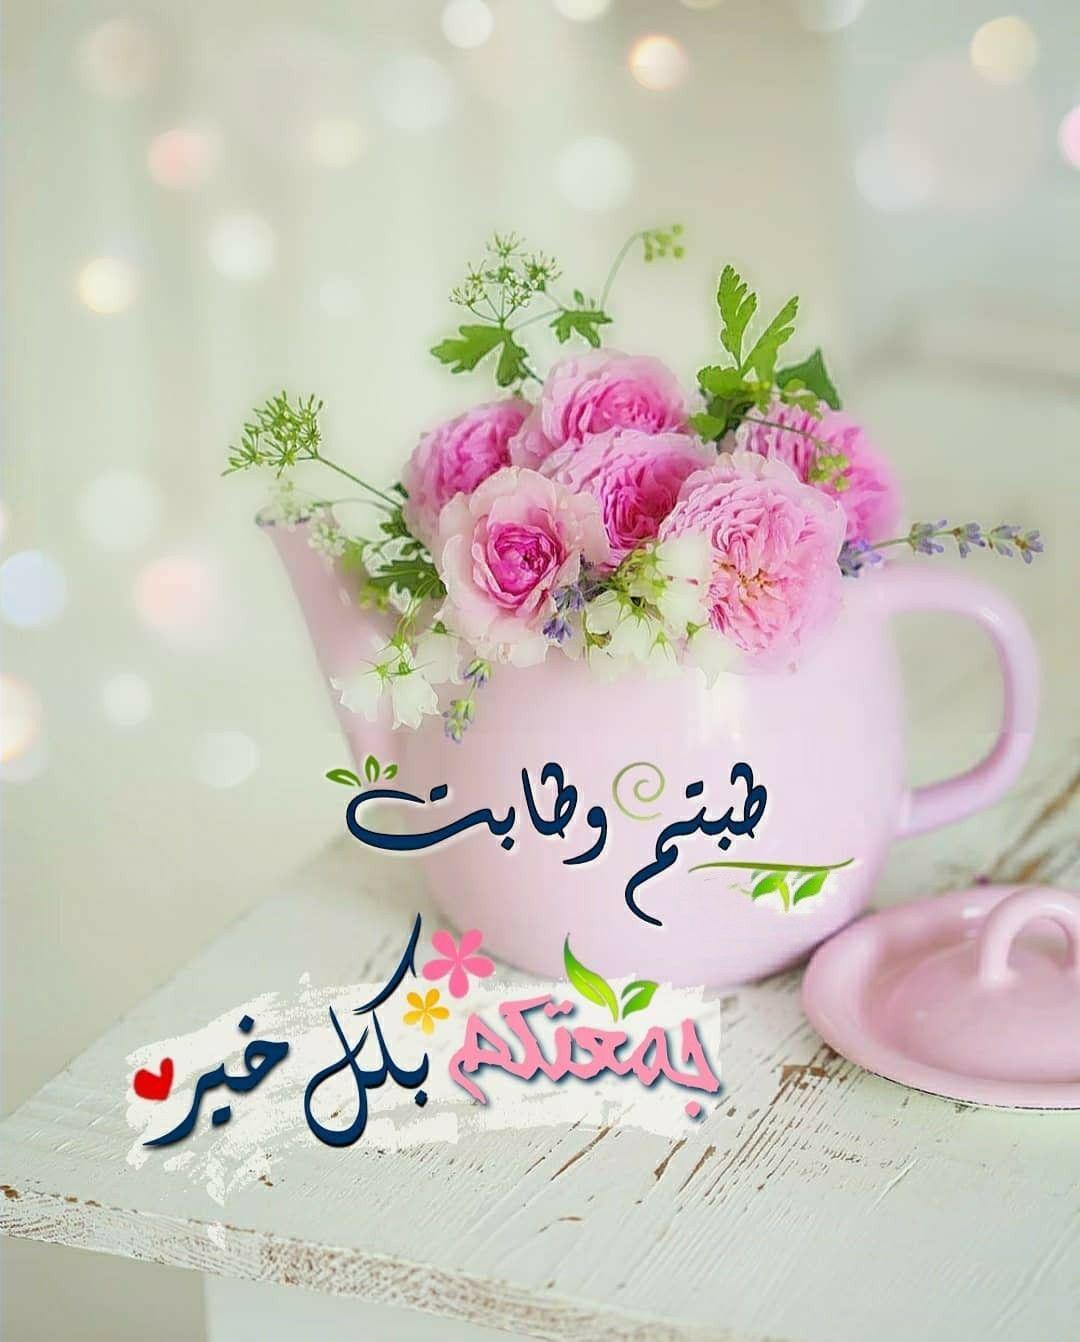 Pin By Fatima Alshreef On صباحكم جميل كابتسامتكم Happy Birthday Pictures Good Morning Flowers Ramadan Prayer